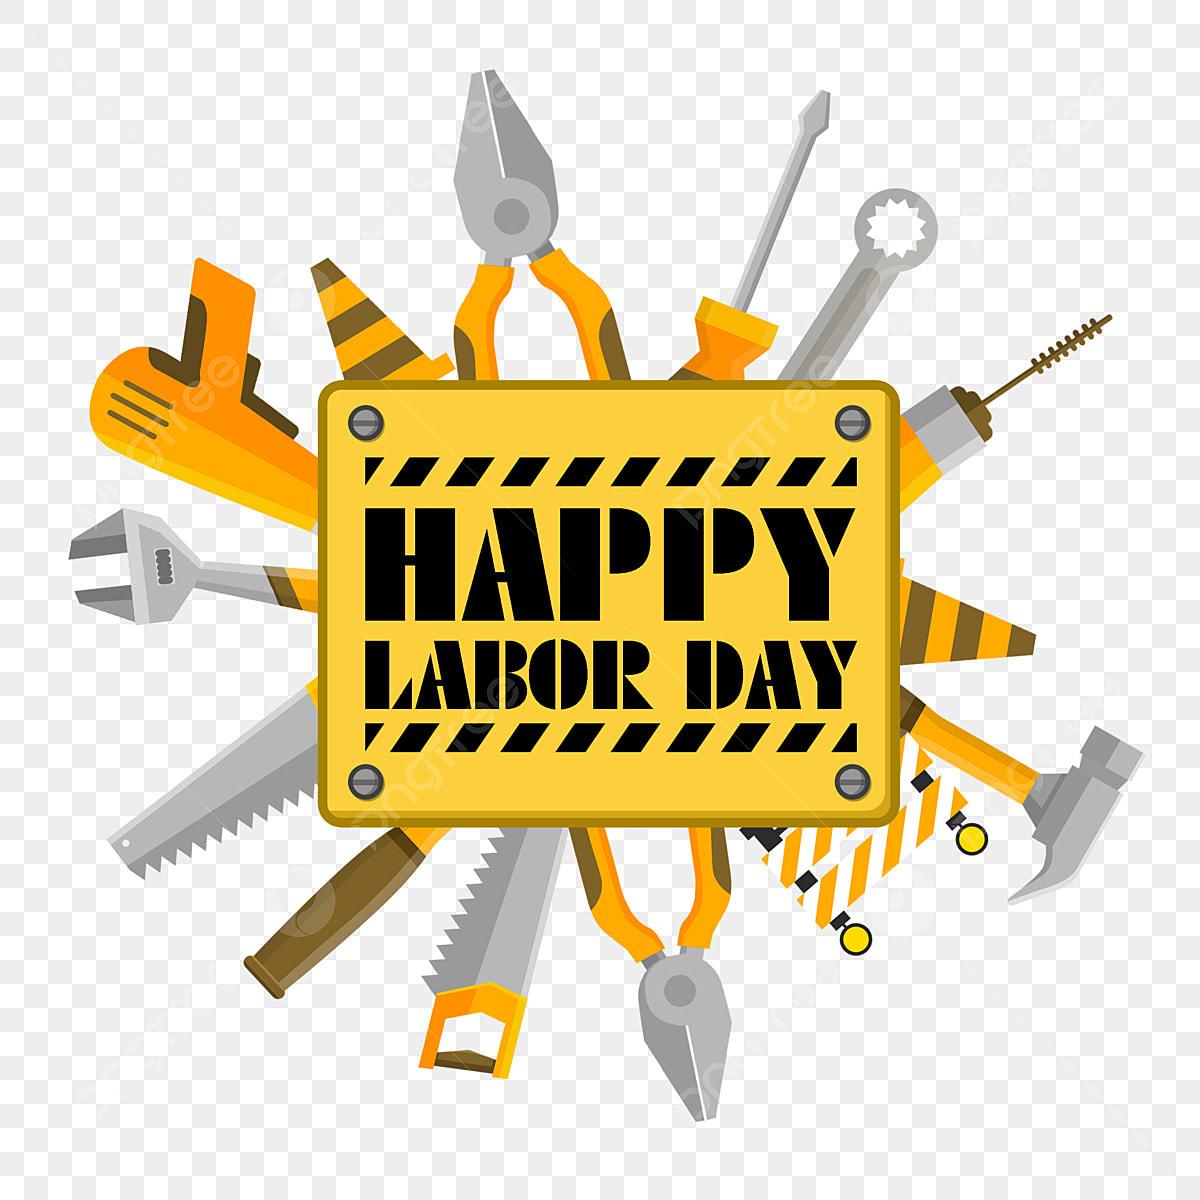 Free Labor Day Clip Art Pictures - Clipartix